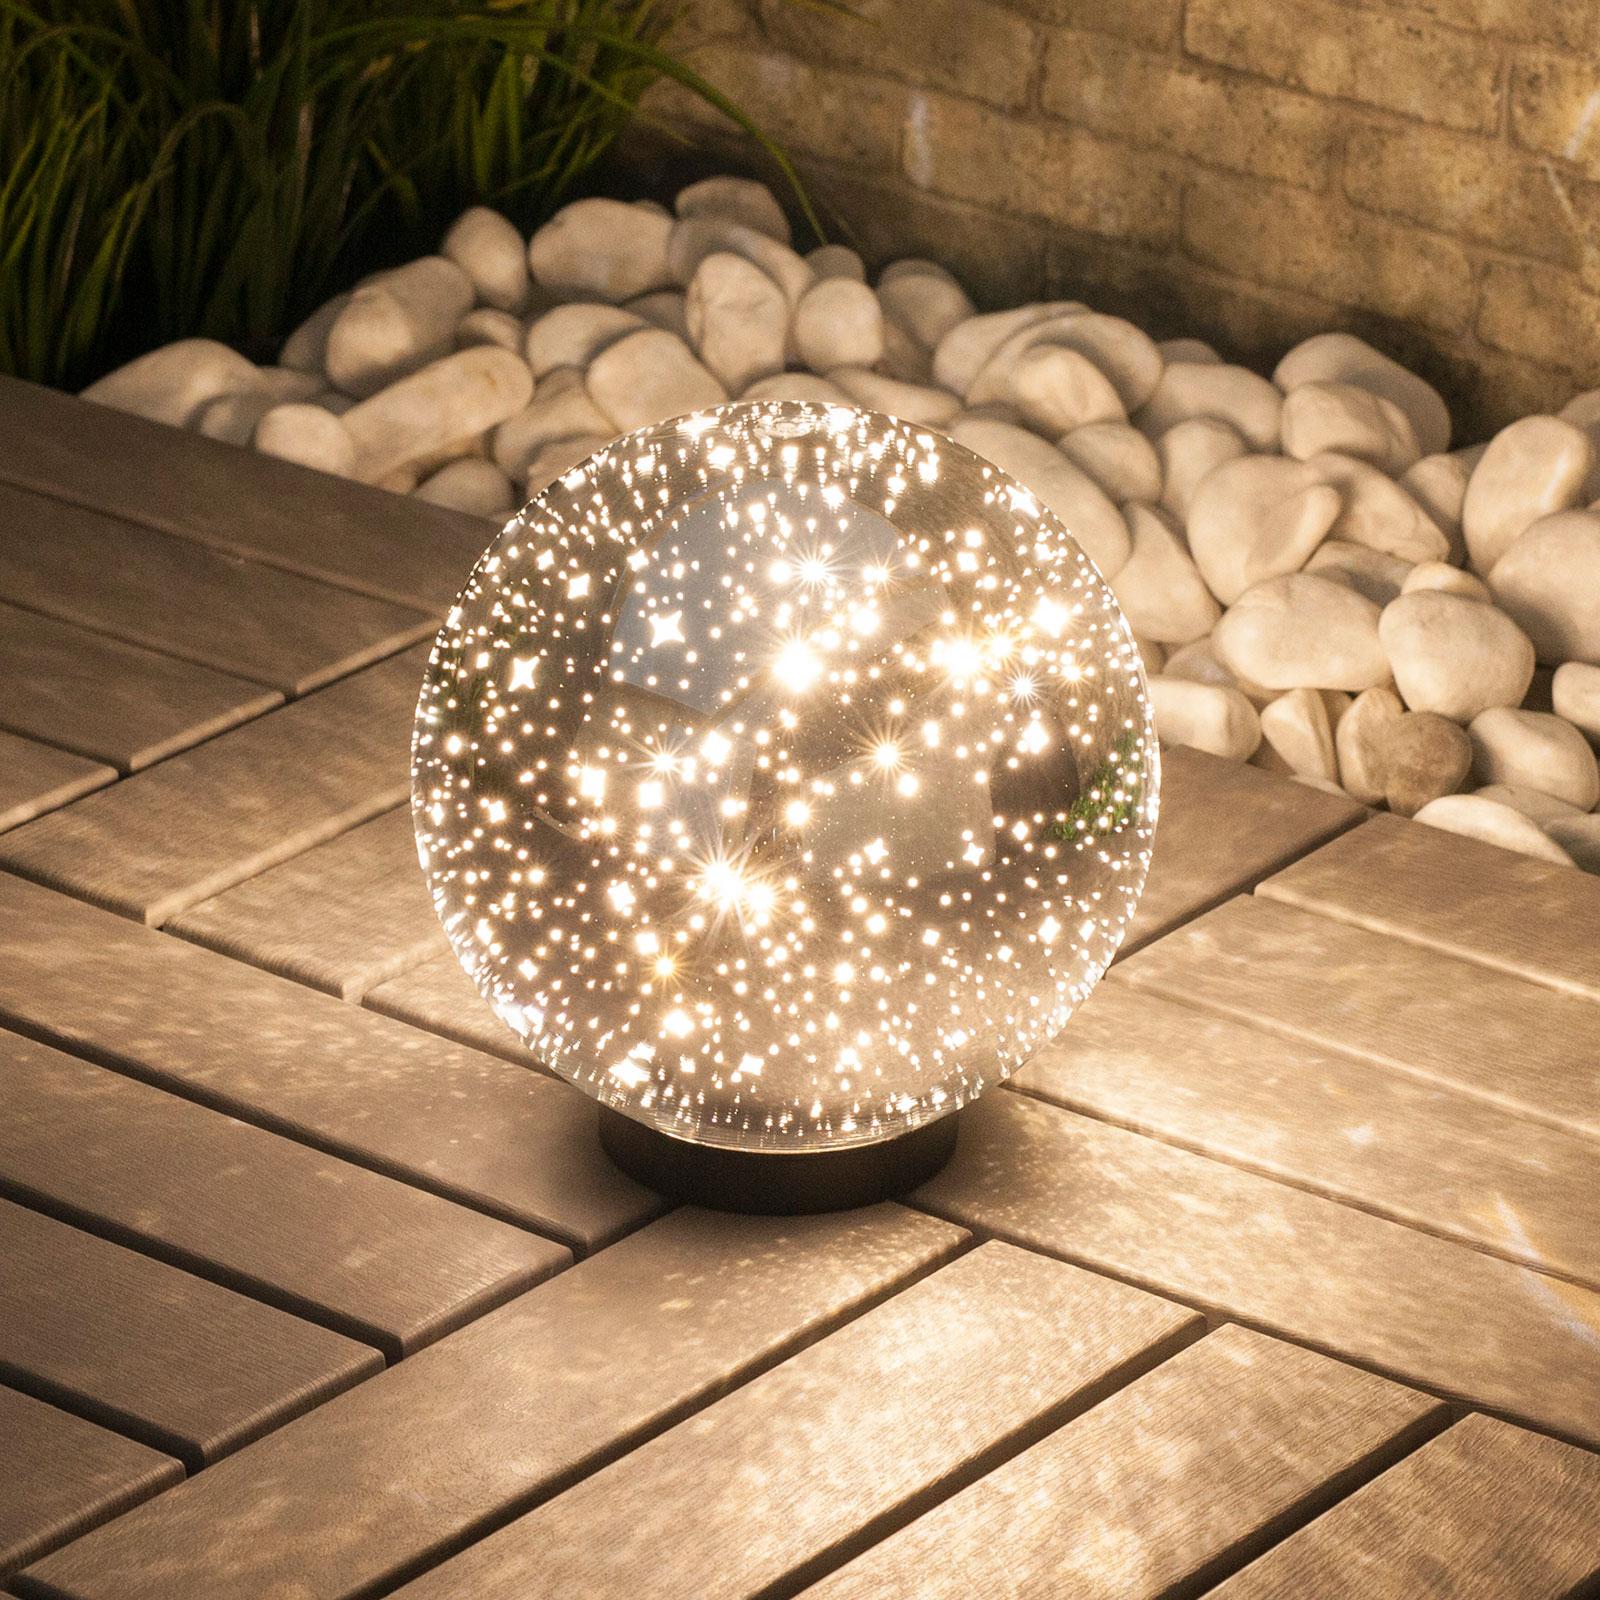 Lindby Kamui LED-dekorationslampa, Ø 20 cm